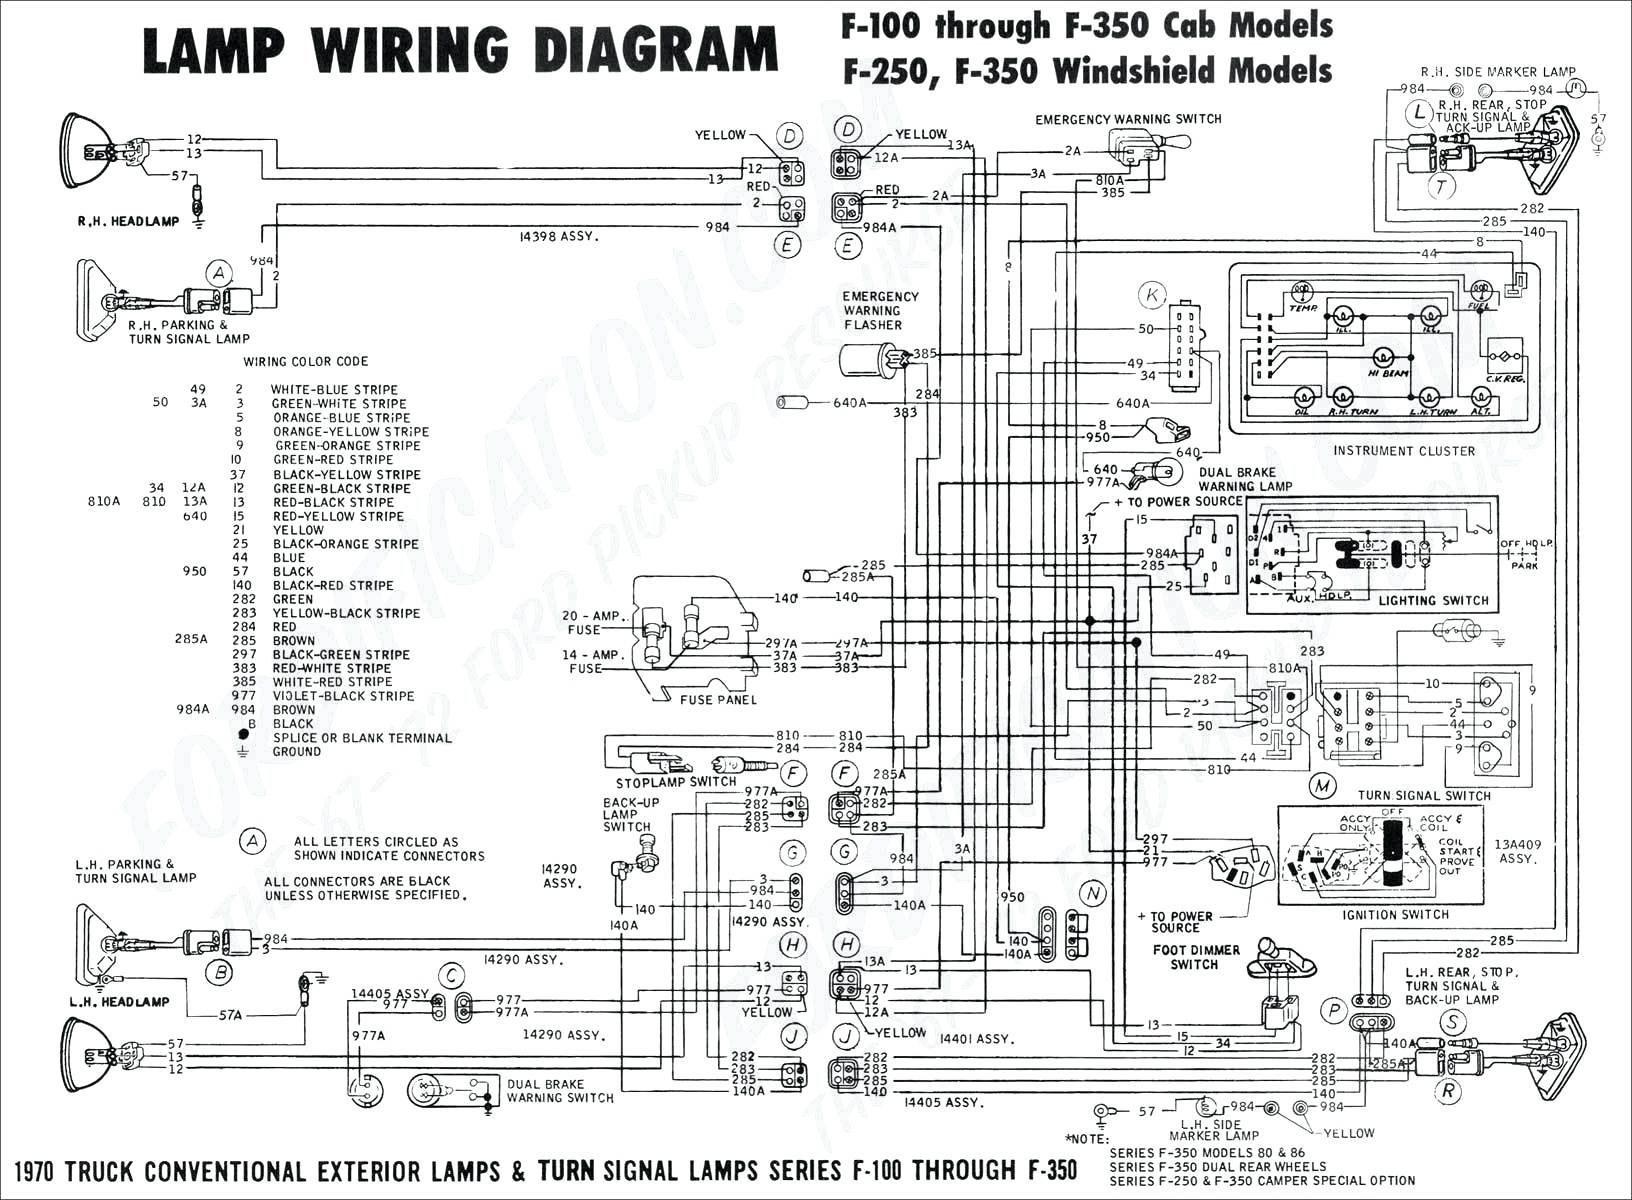 Zn 6852 1994 S10 Rear Wiper Motor Wiring Diagram 1995 Chevrolet S10 Ca Download Diagram